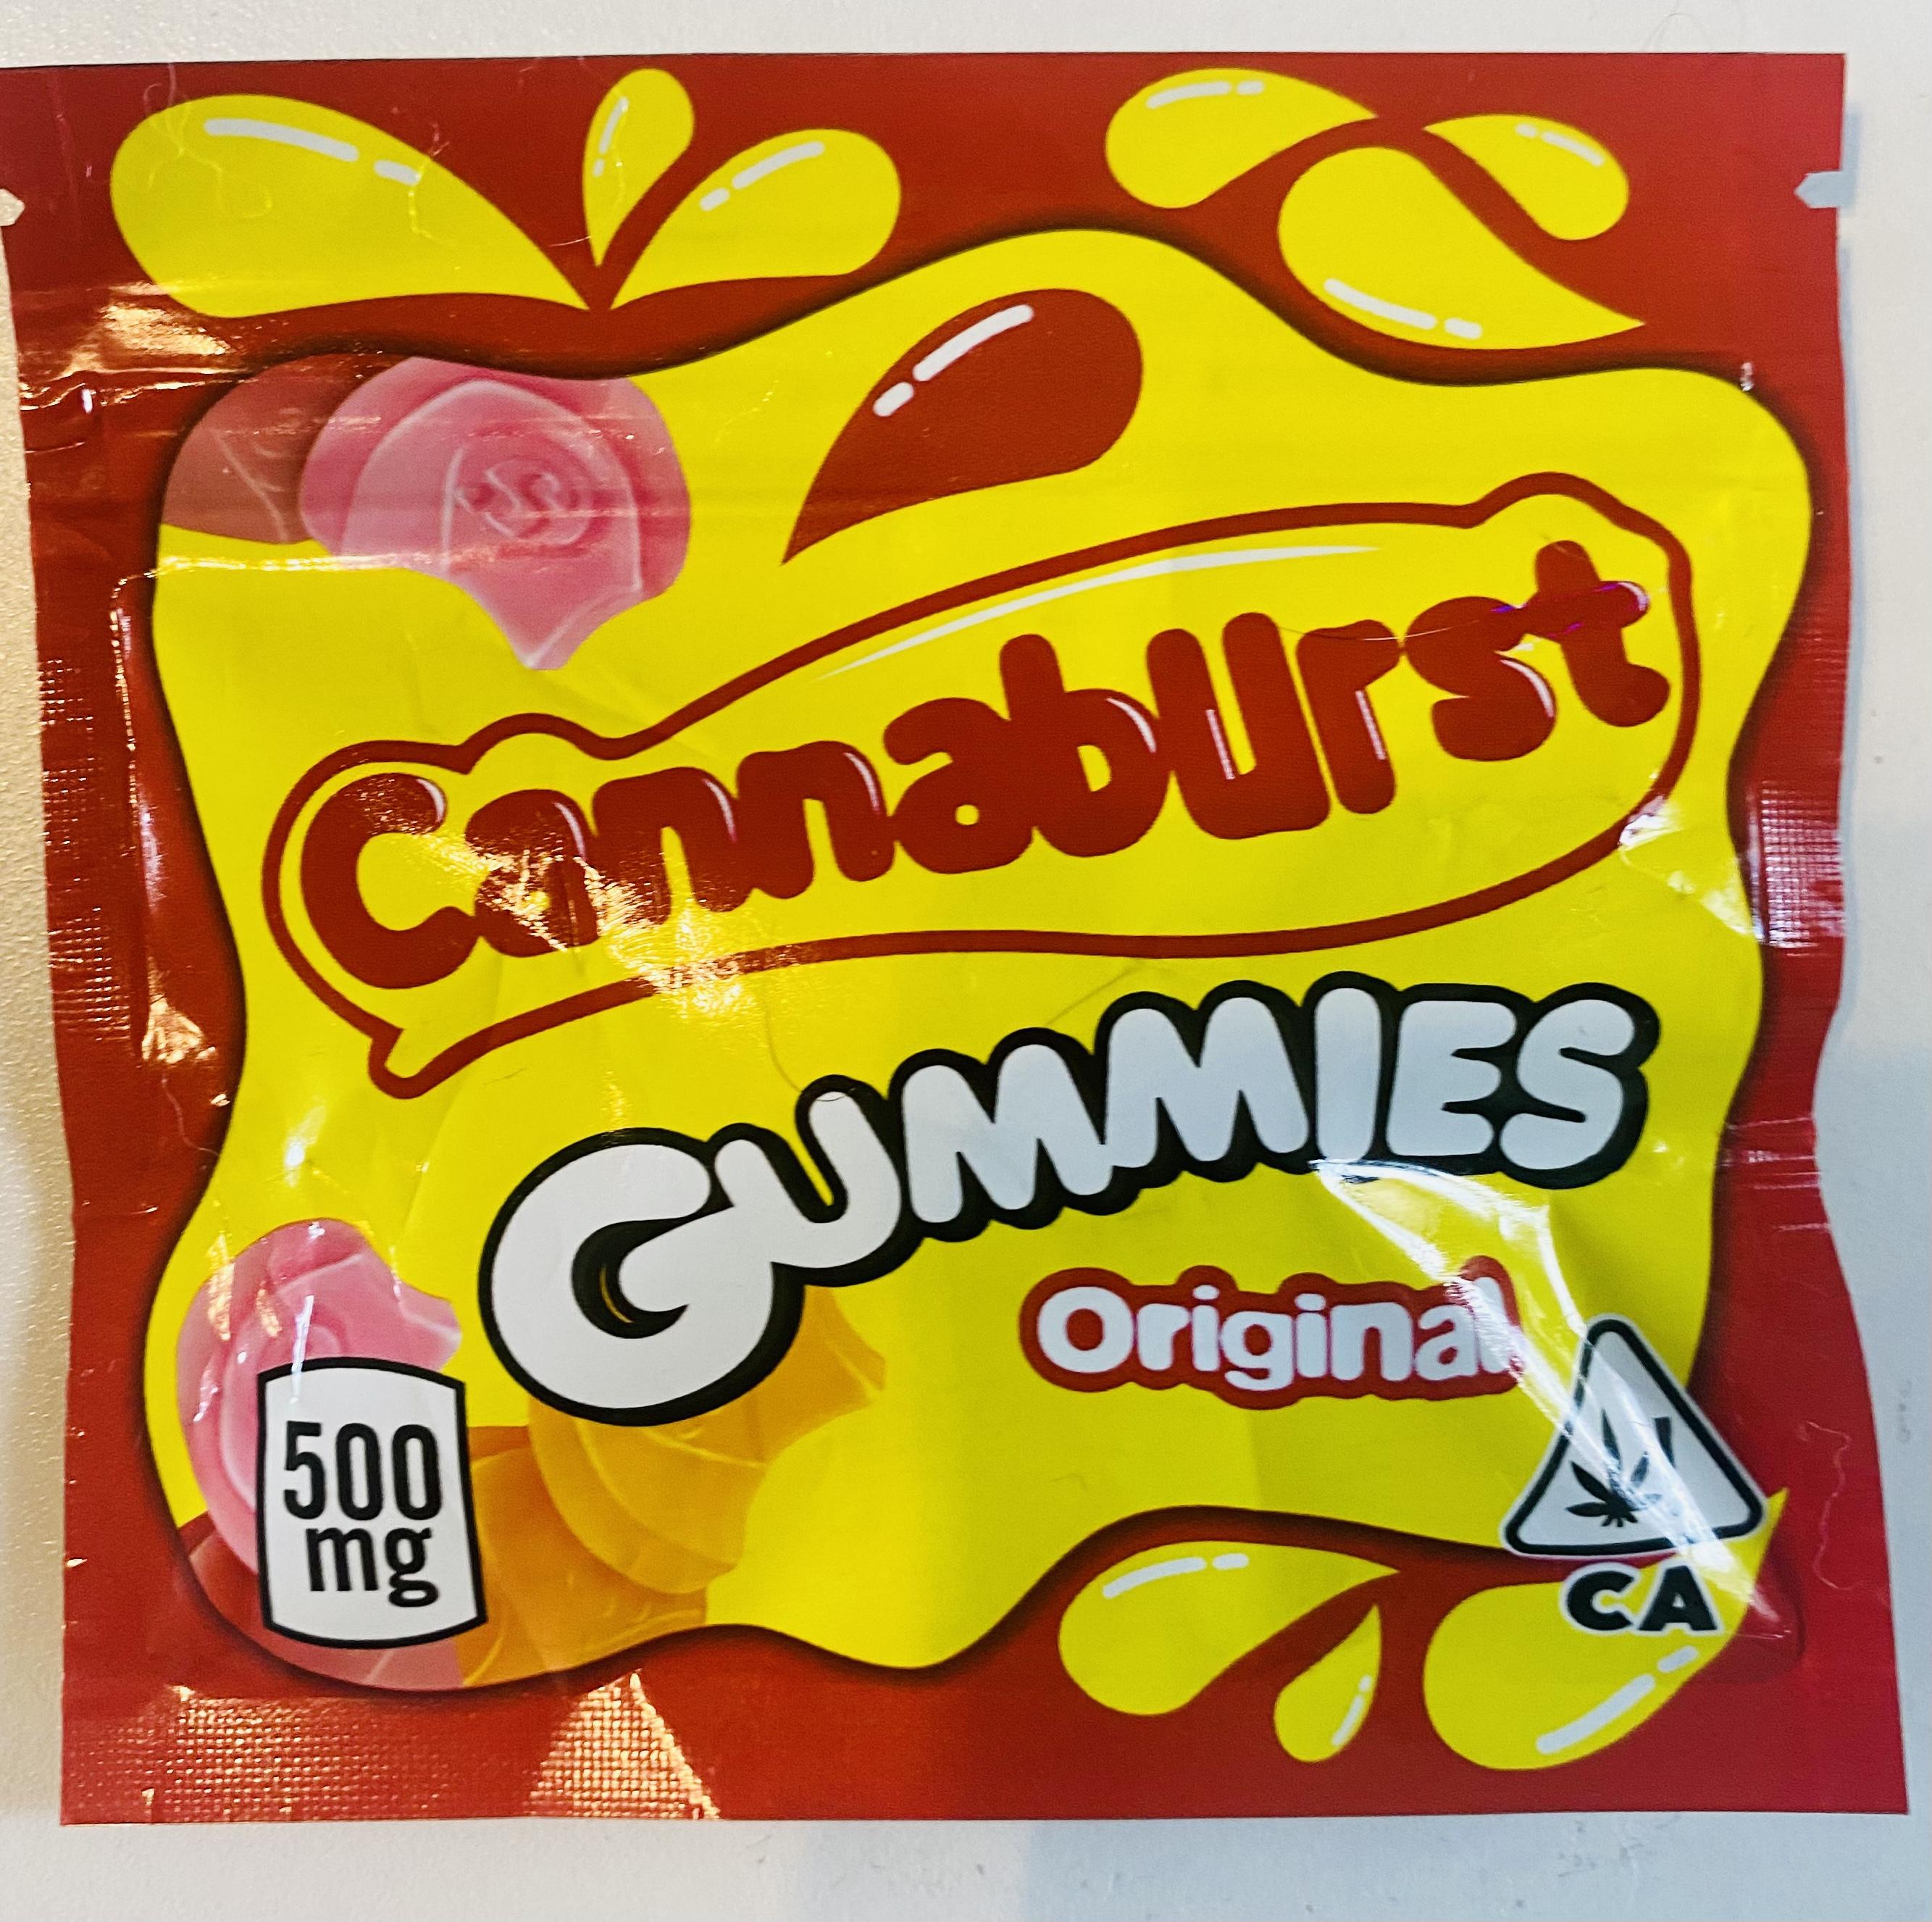 CANNABURST GUMMIES ✴️ (500mg)